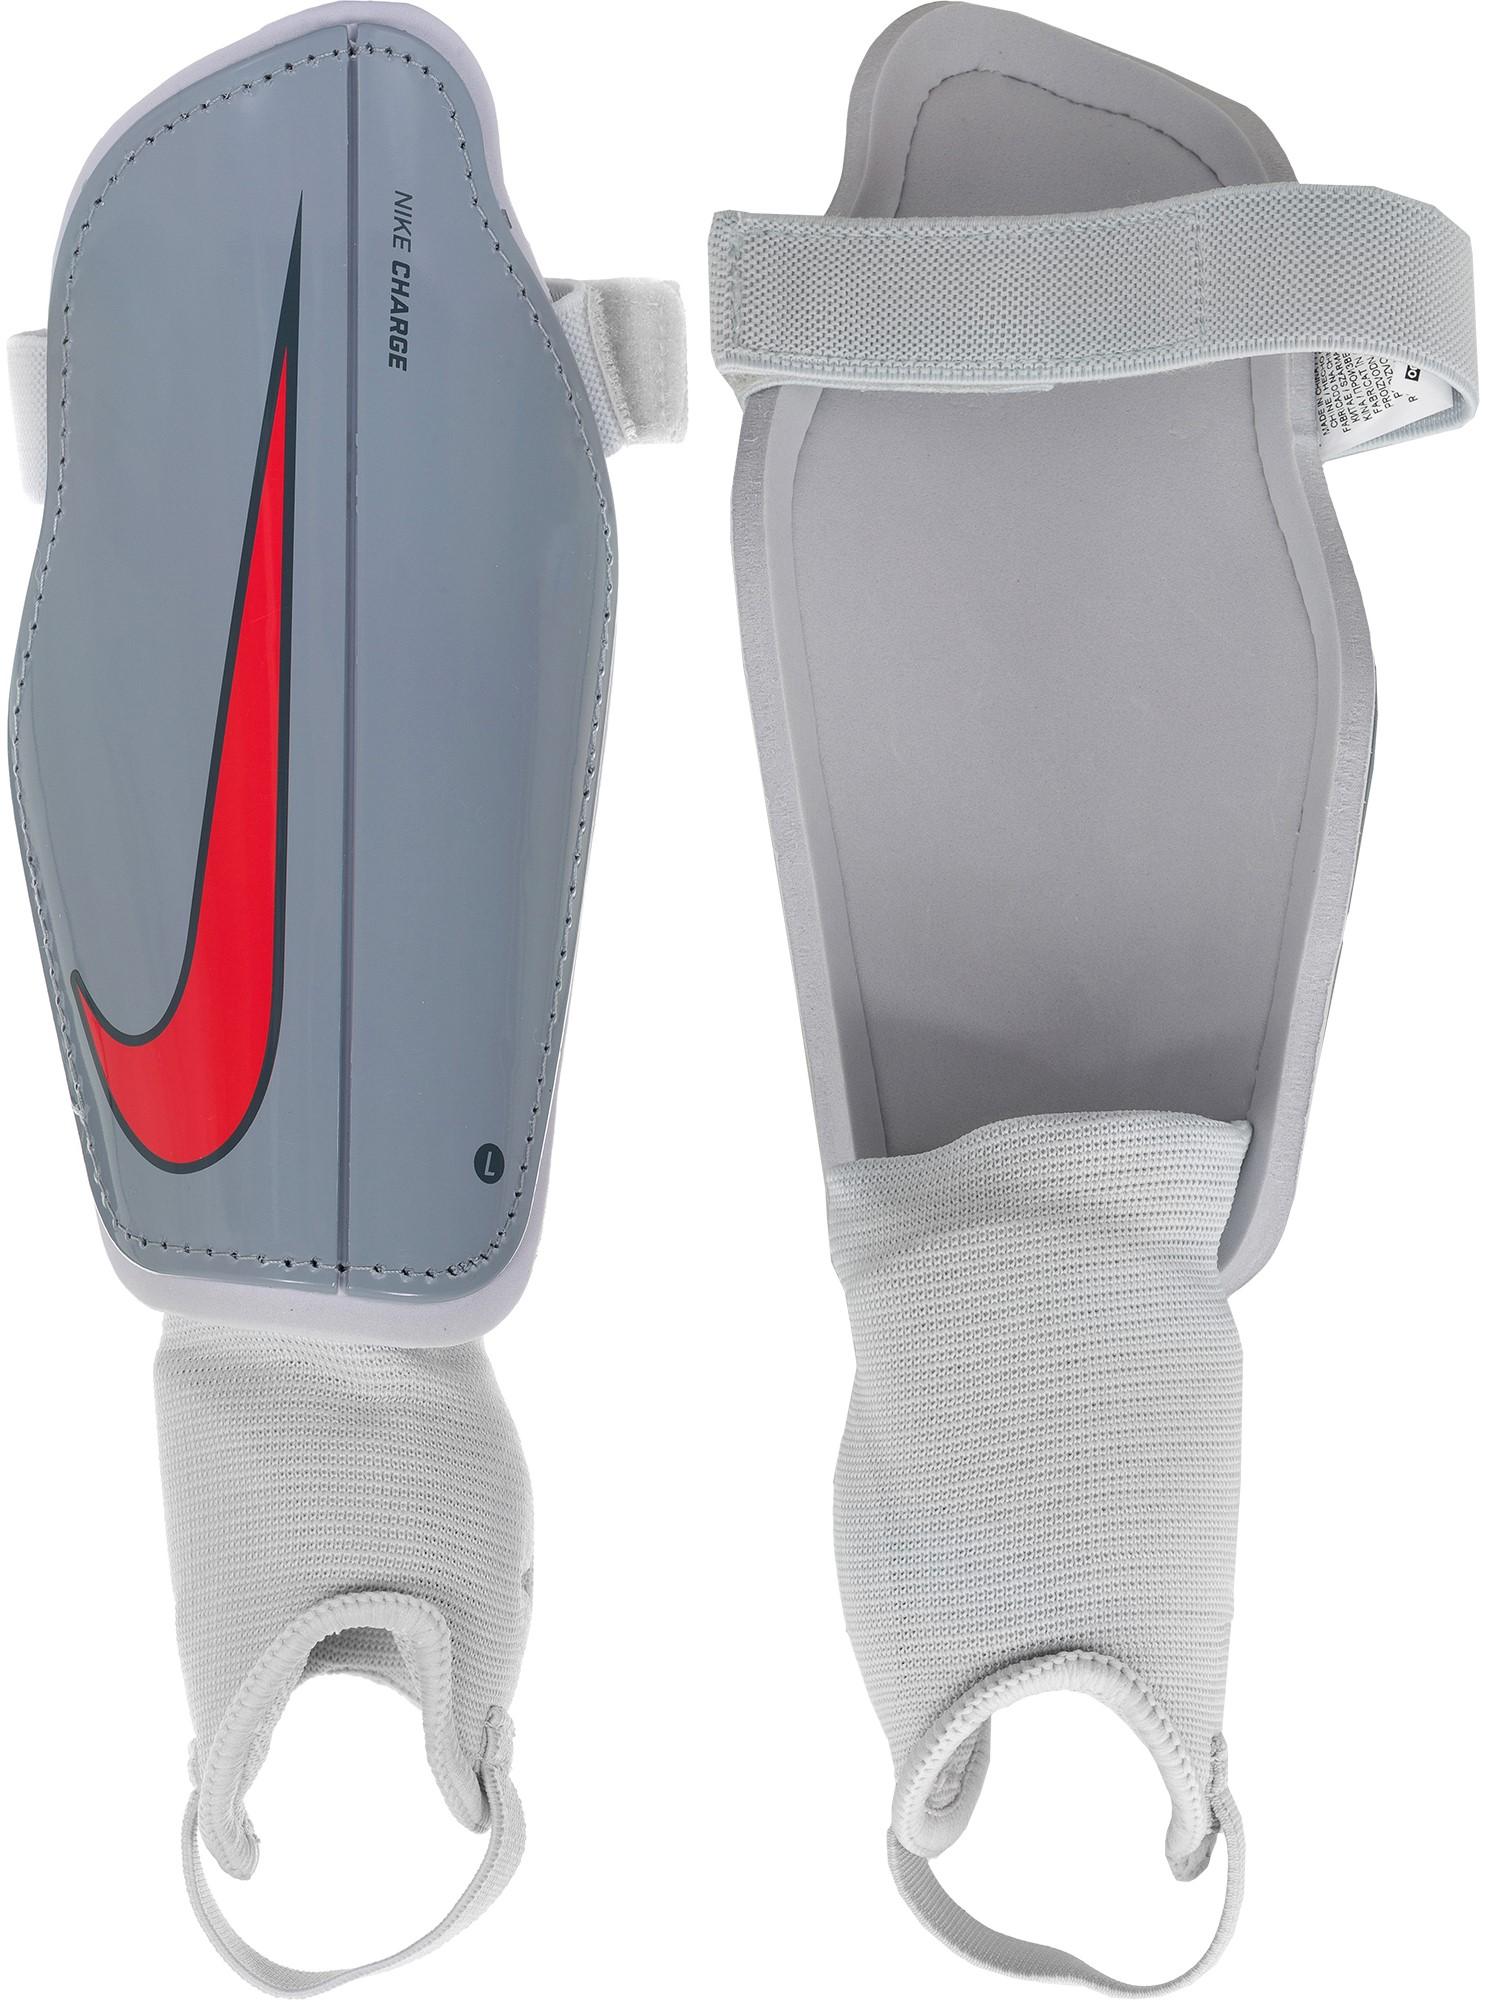 Nike Щитки футбольные детские Nike Youth Charge 2.0, размер 120-130 щитки футбольные mitre tungsten slip